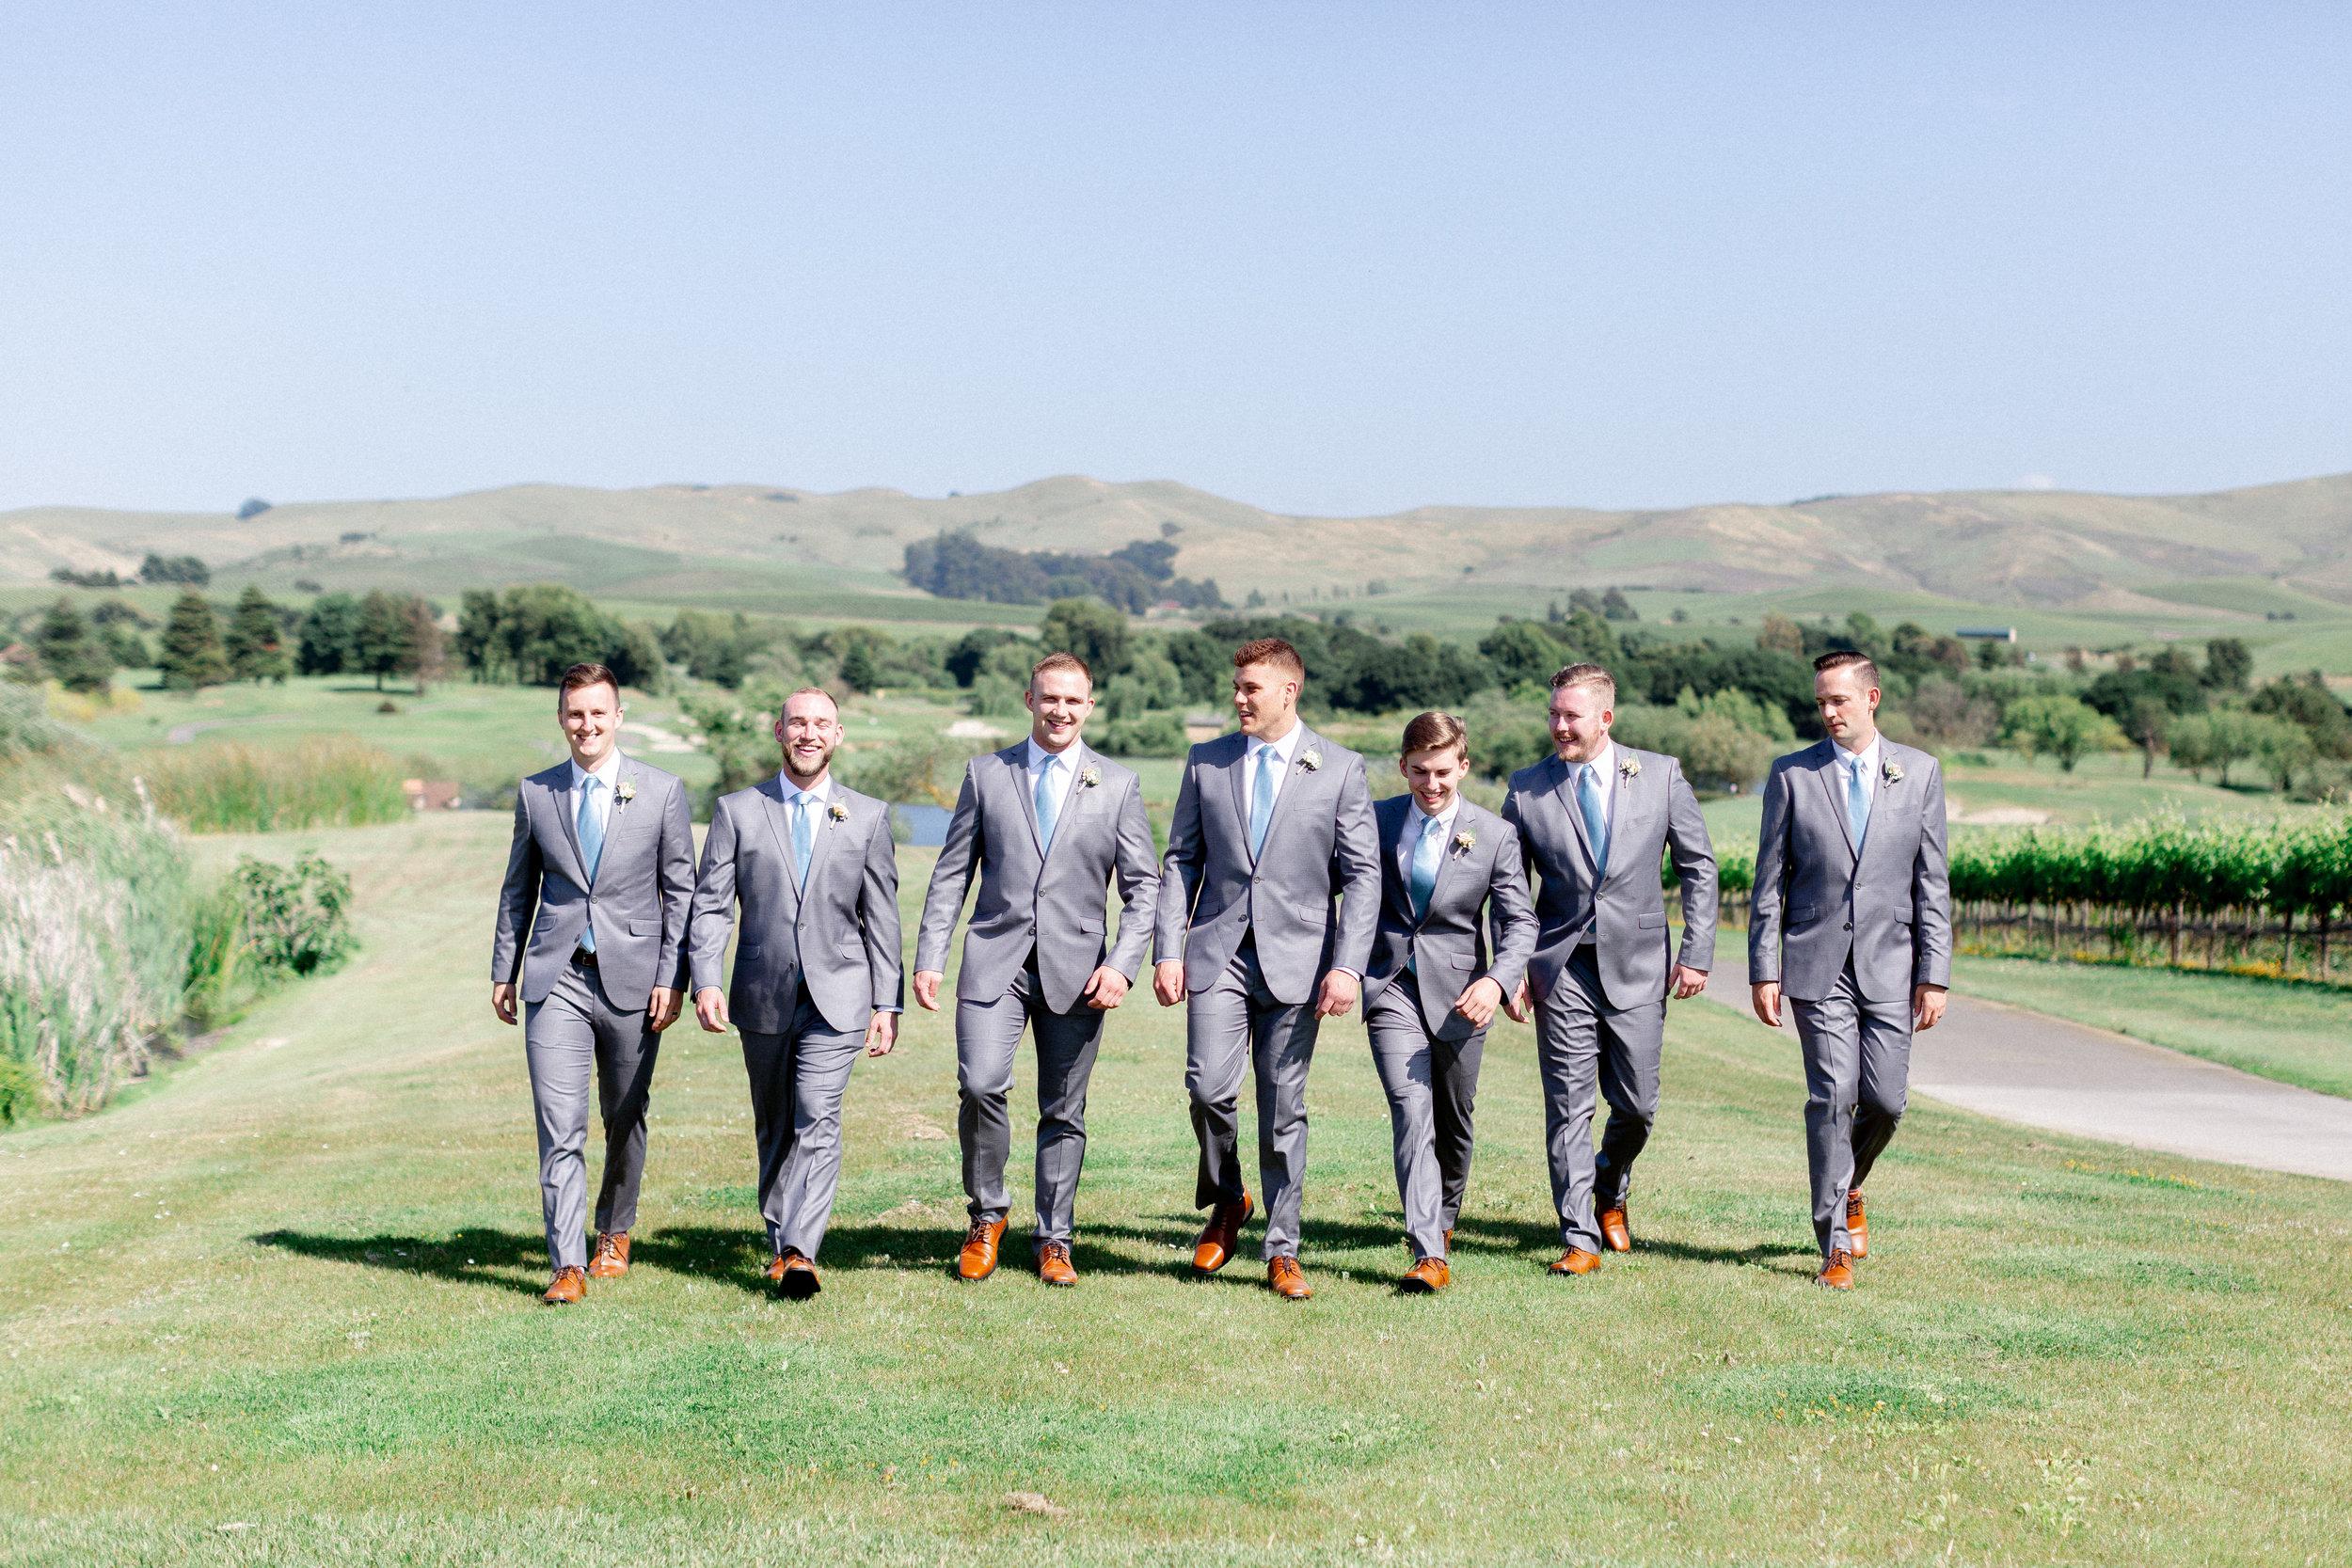 Eagle-Vines-Golf-Course-wedding-photographer (62 of 206).jpg